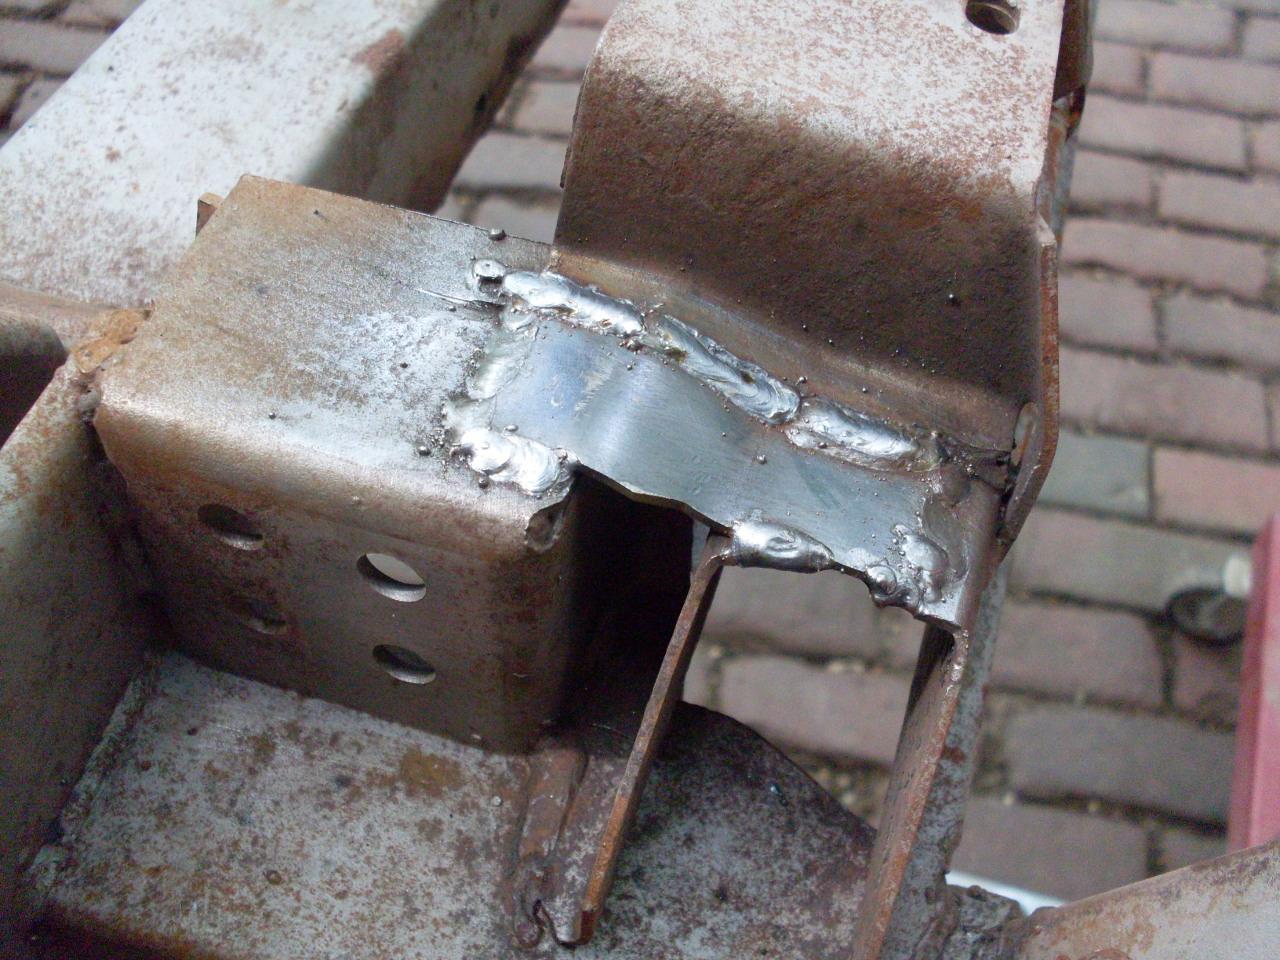 chassis reinforcement - tr6 forum - tr register forum